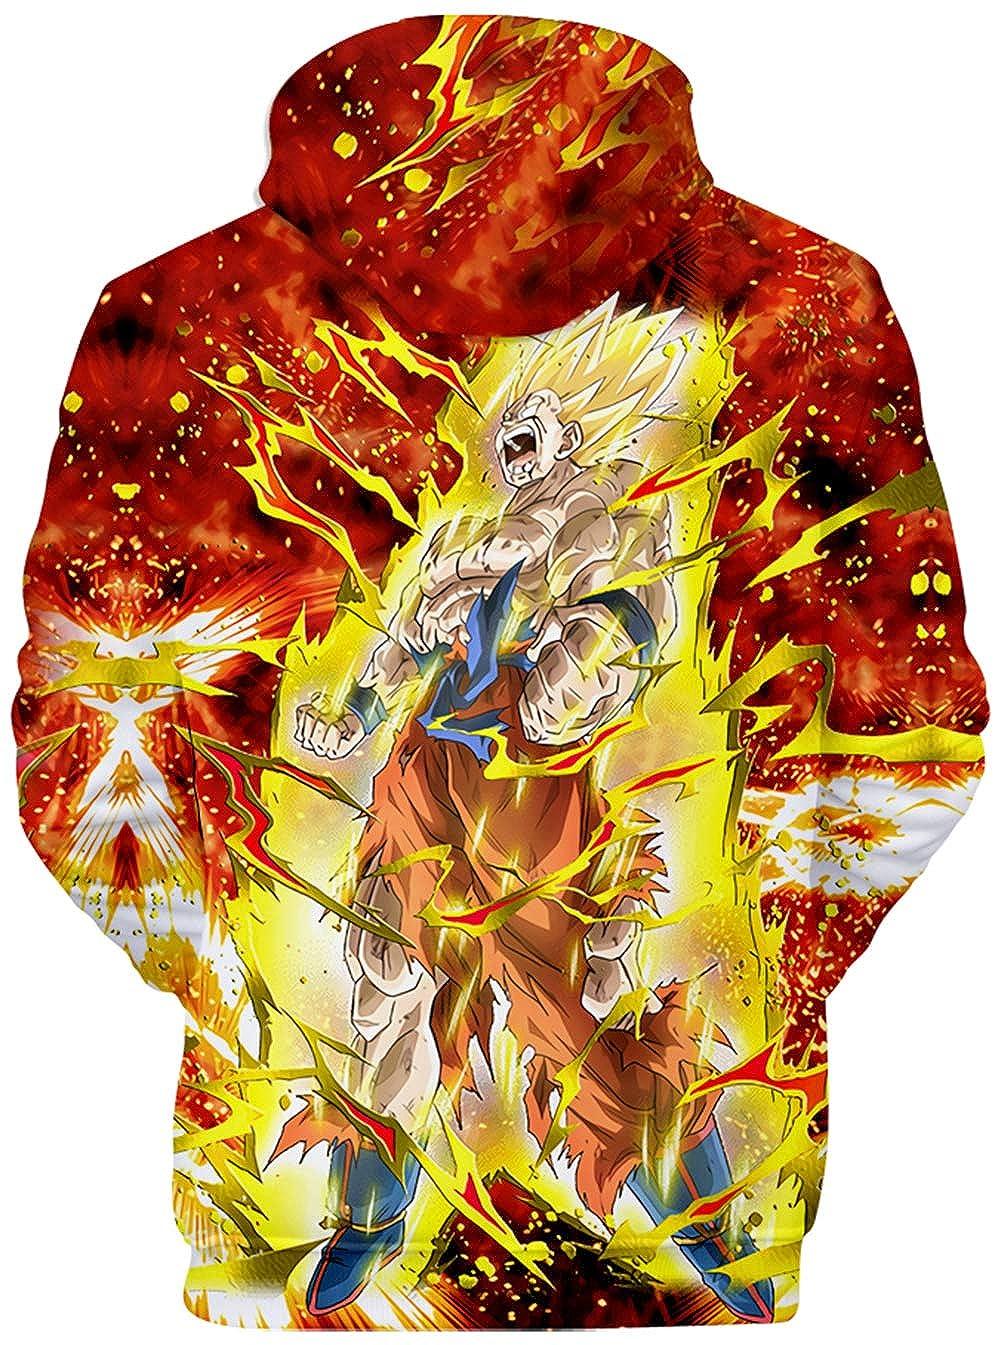 YIMIAO Unisexe Anime Dragon Ball Sweat-Shirt /à Capuche Super Pull 3D Manches Longues Sweat Goku